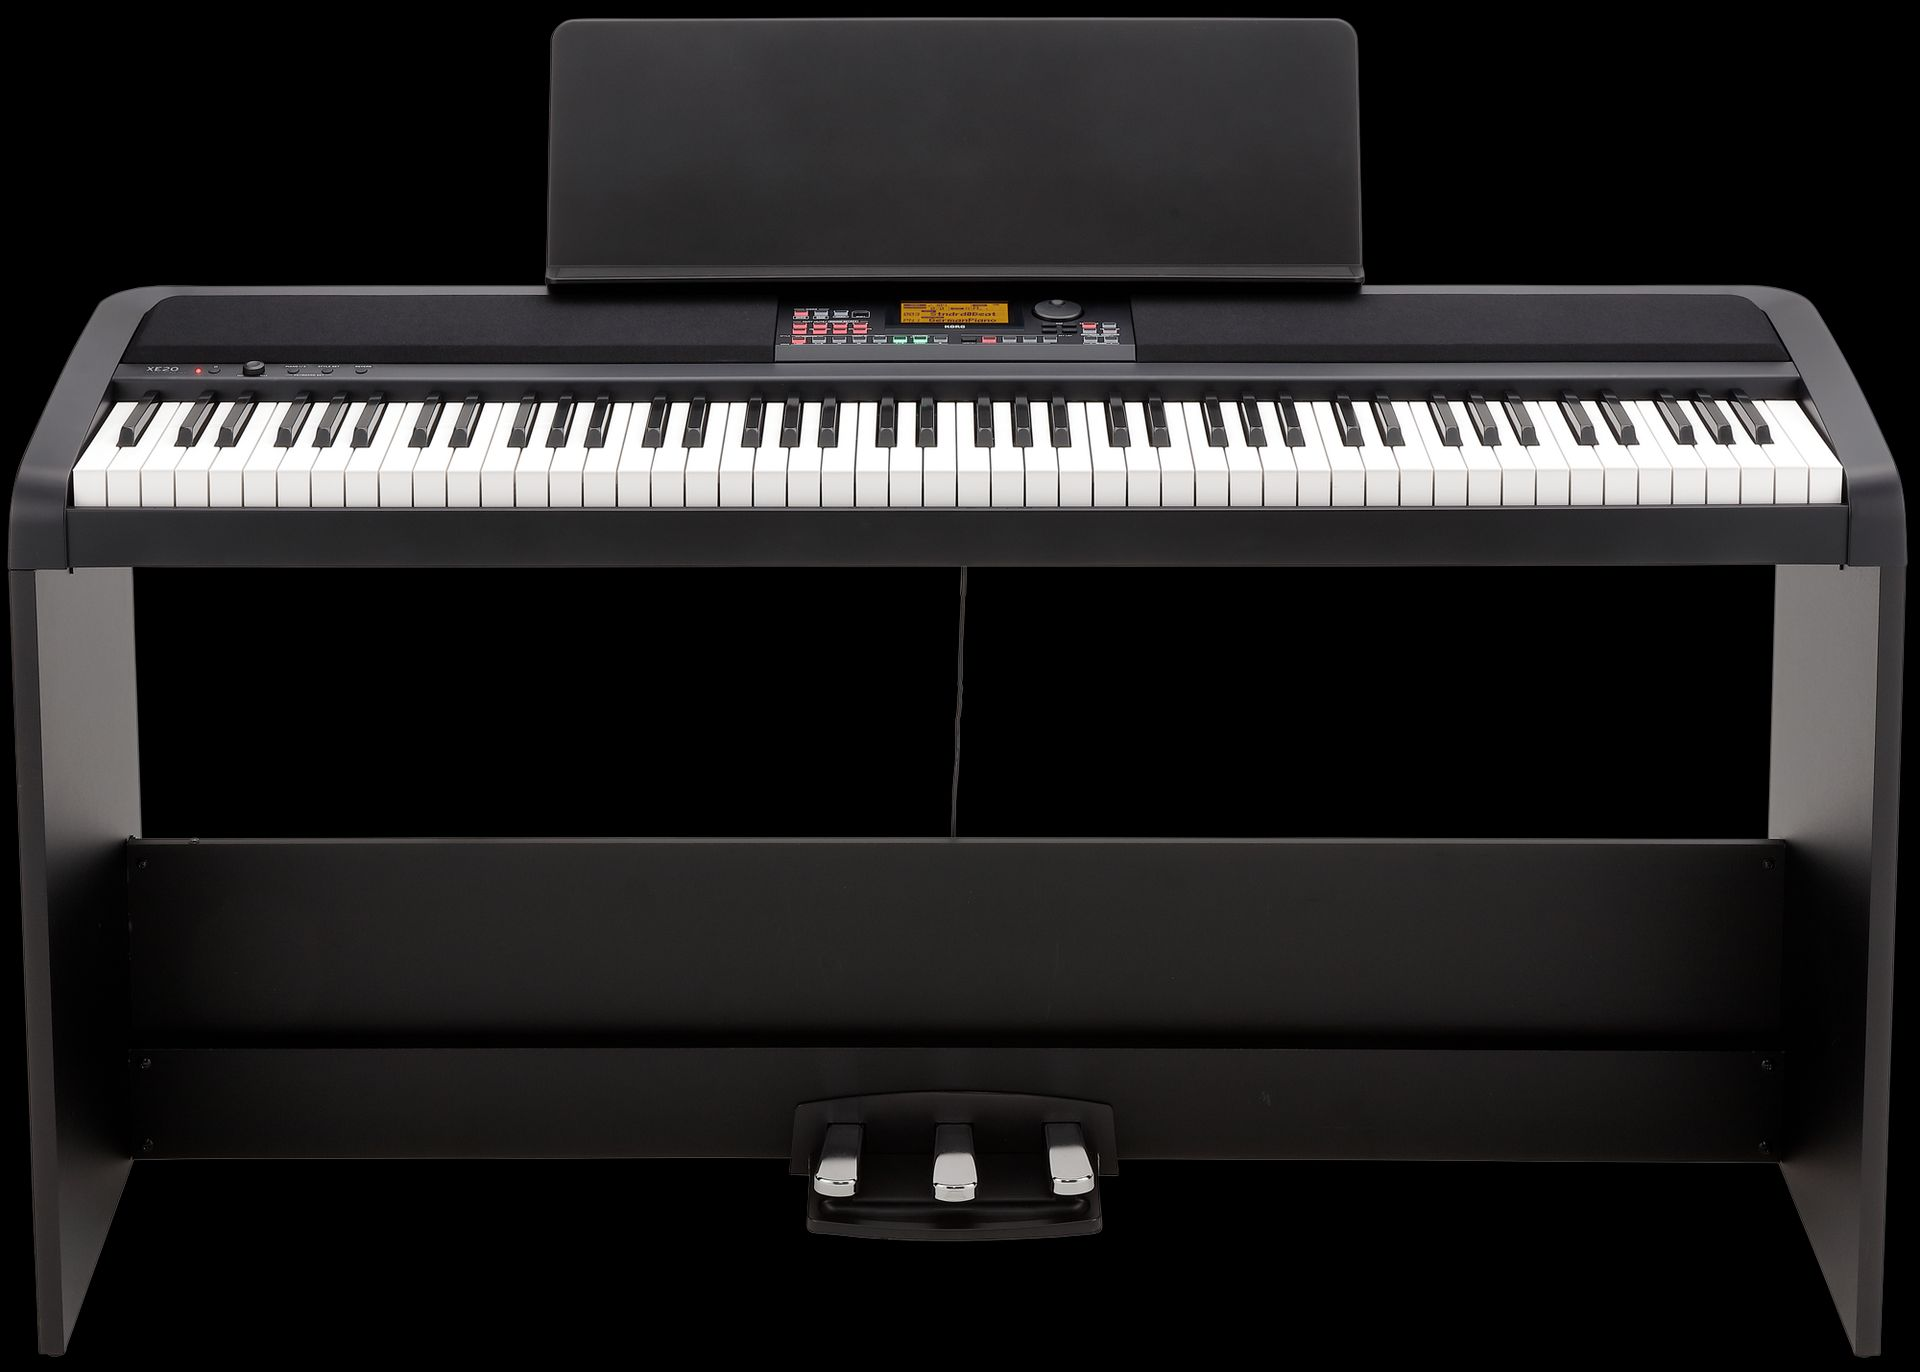 Korg XE20 SP Digitalpiano, Ensemblepiano, incl. Untergestell und Pedaleinheit,